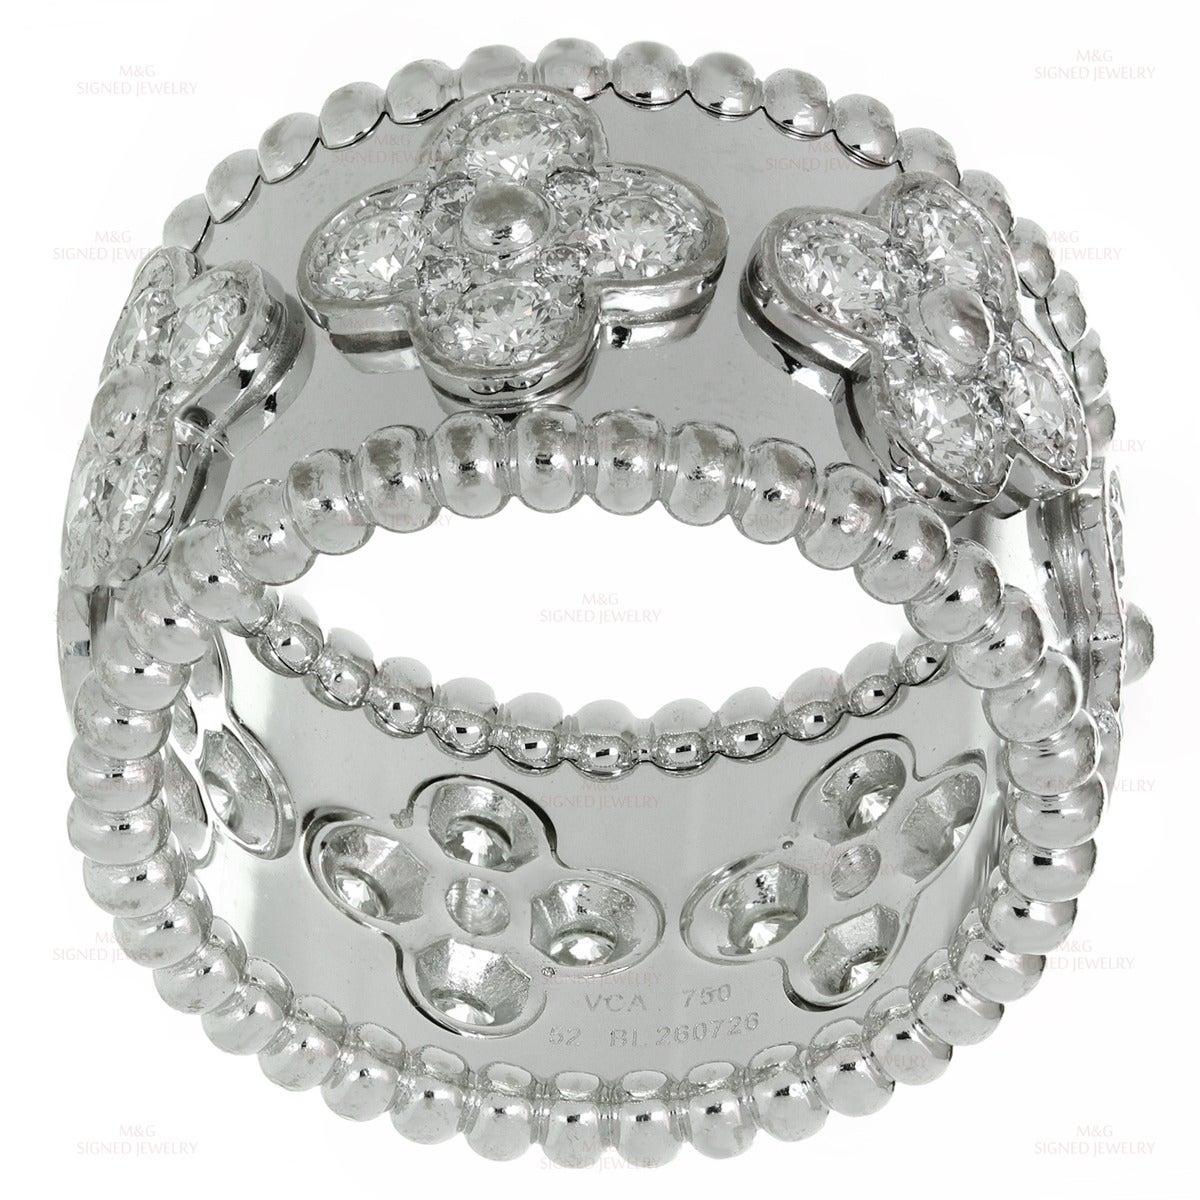 Van Cleef & Arpels Perlee Clover Diamond Gold Band Ring 2